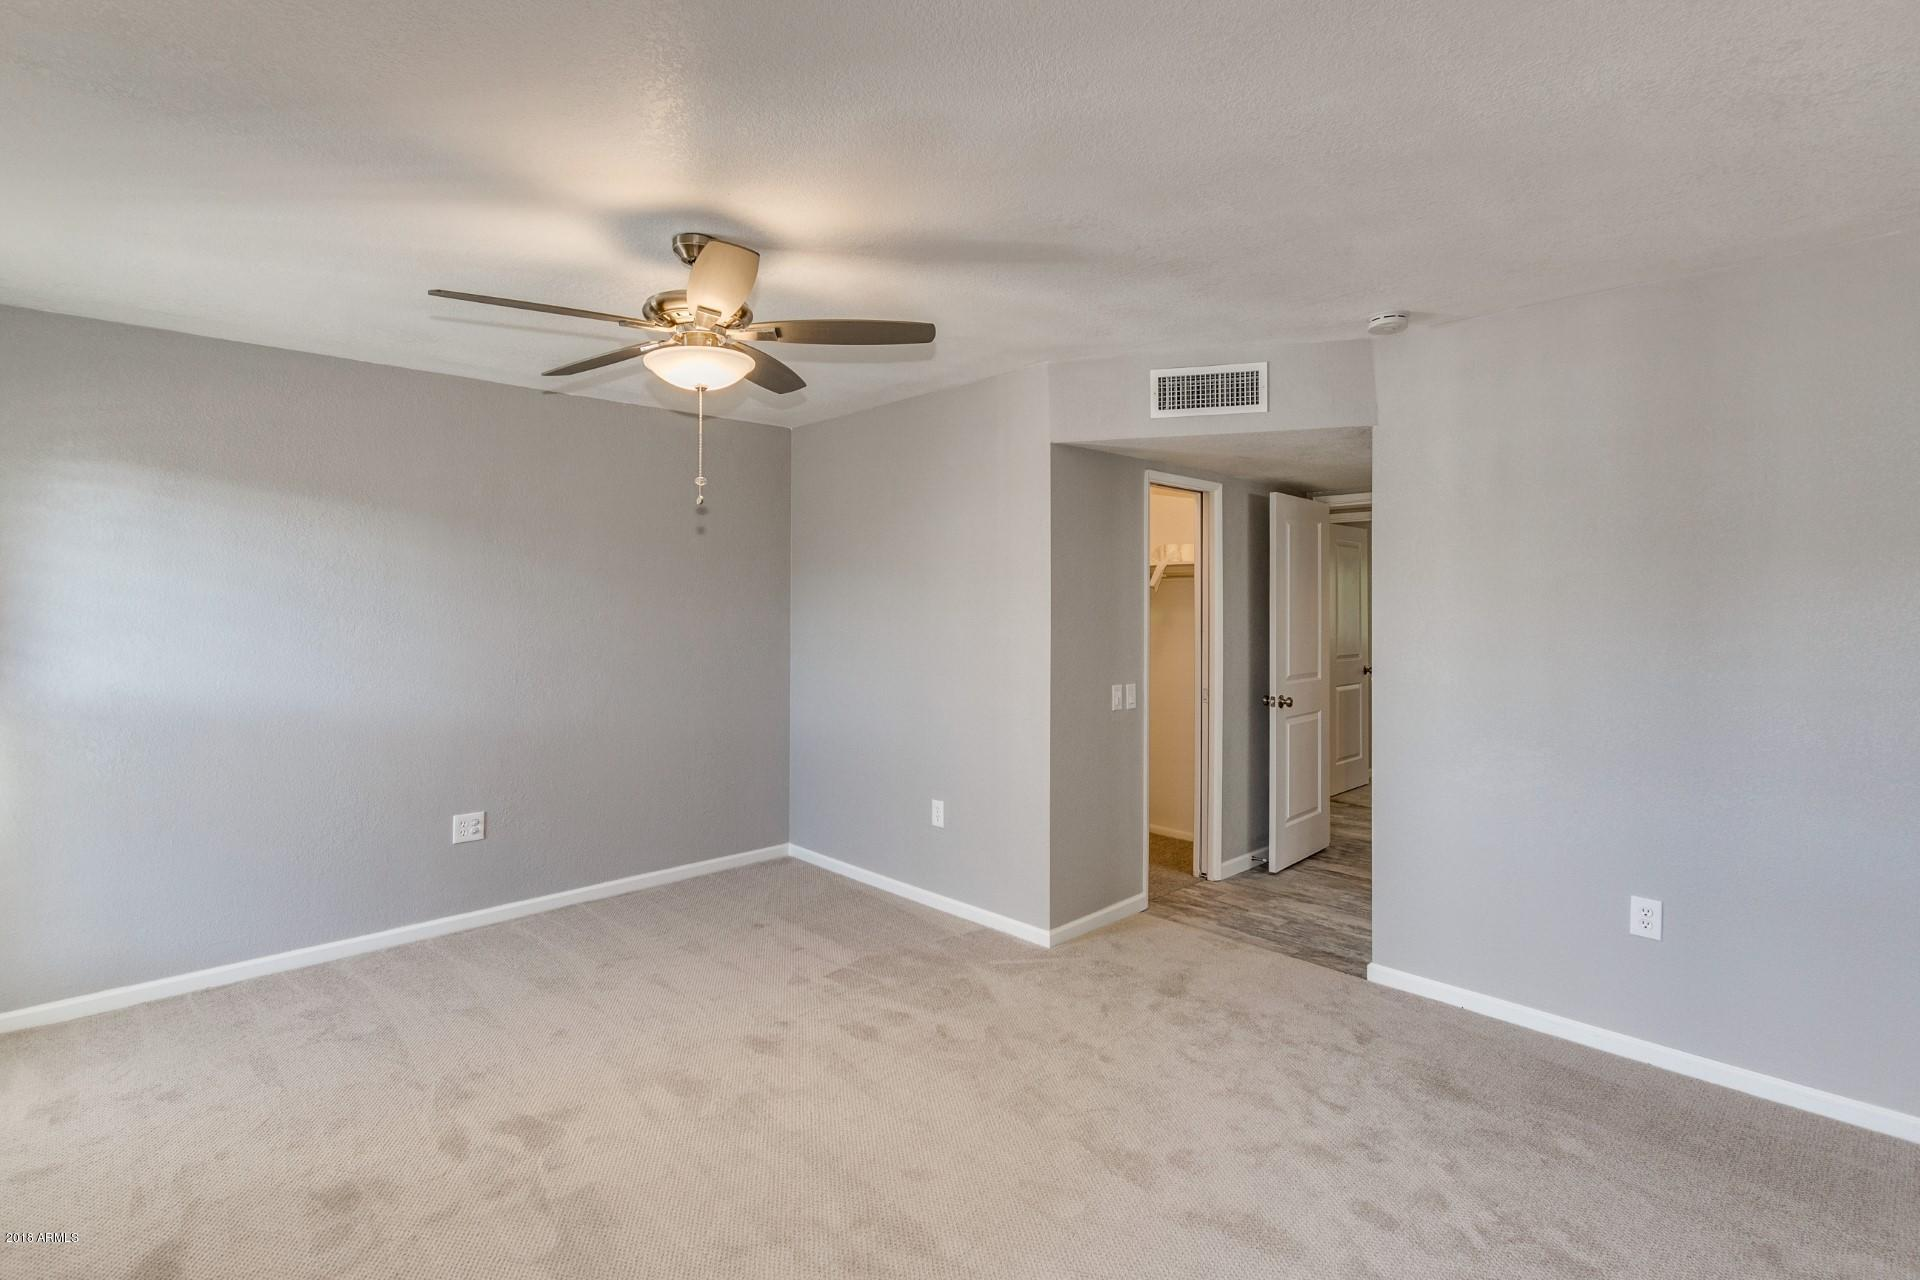 MLS 5845527 12947 W COPPERSTONE Drive, Sun City West, AZ 85375 Sun City West AZ Condo or Townhome